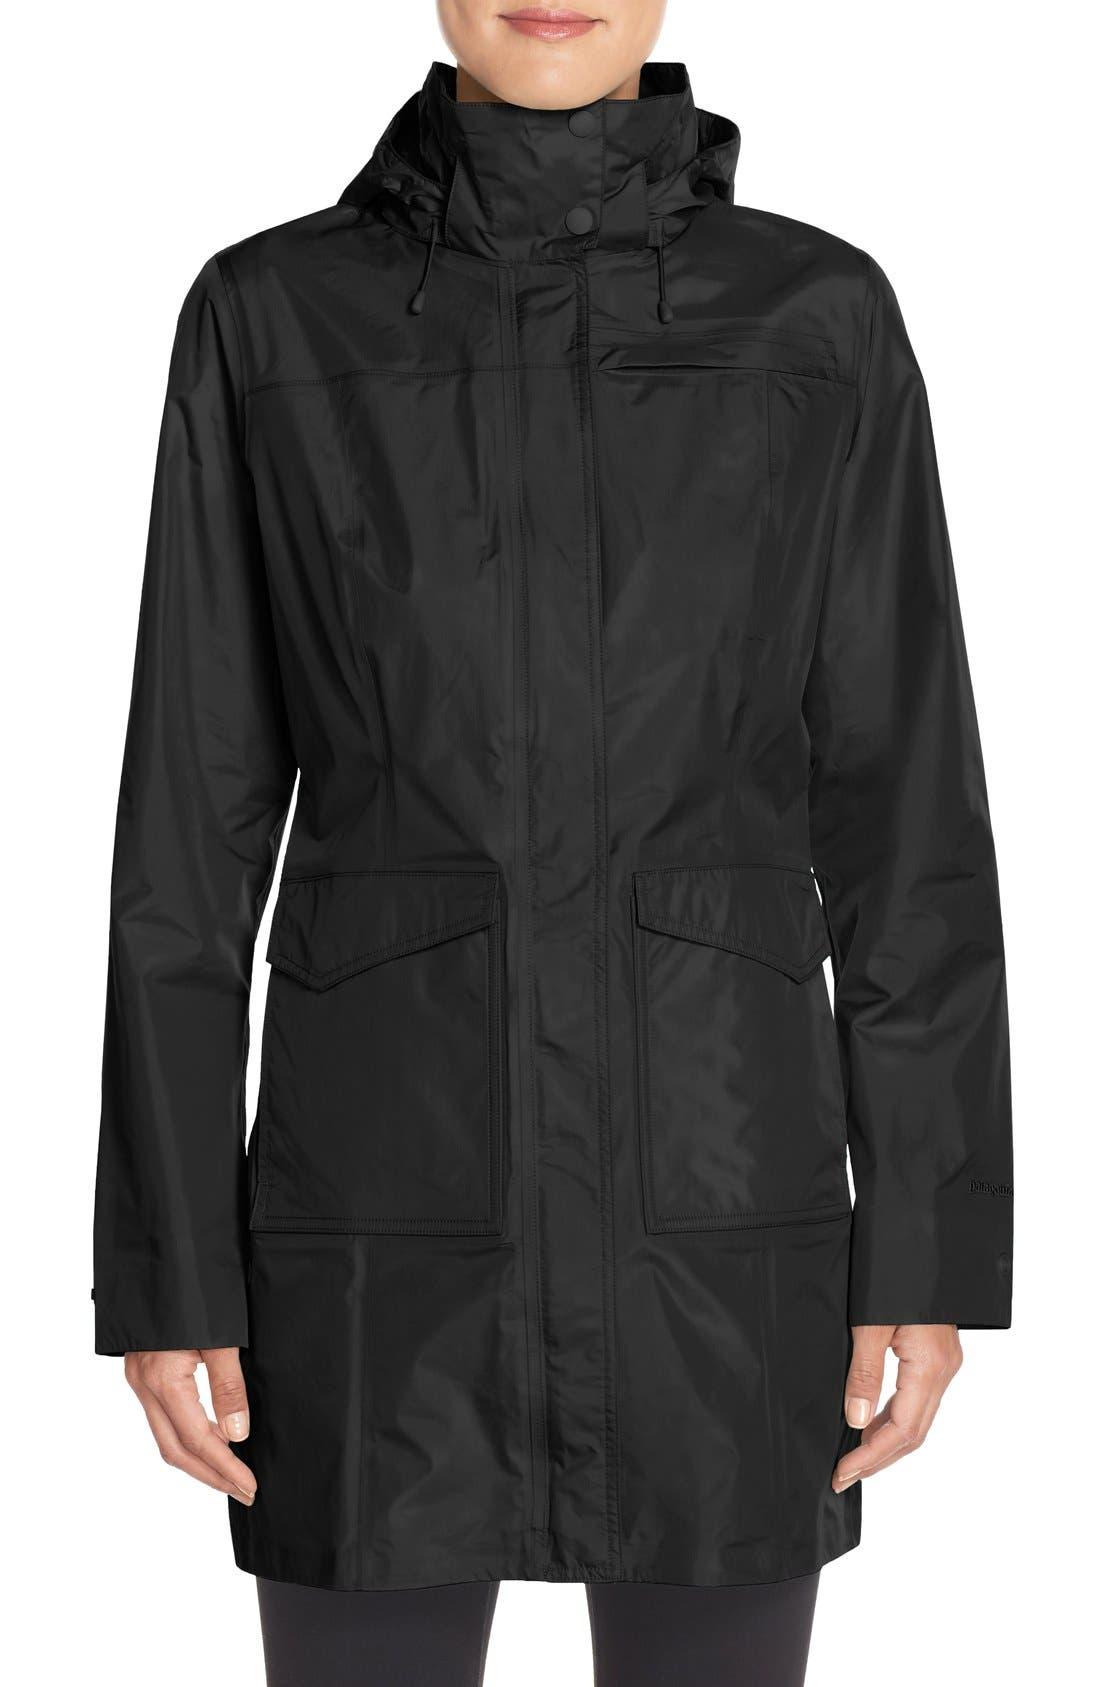 'Torrentshell' Waterproof City Coat,                             Main thumbnail 1, color,                             001